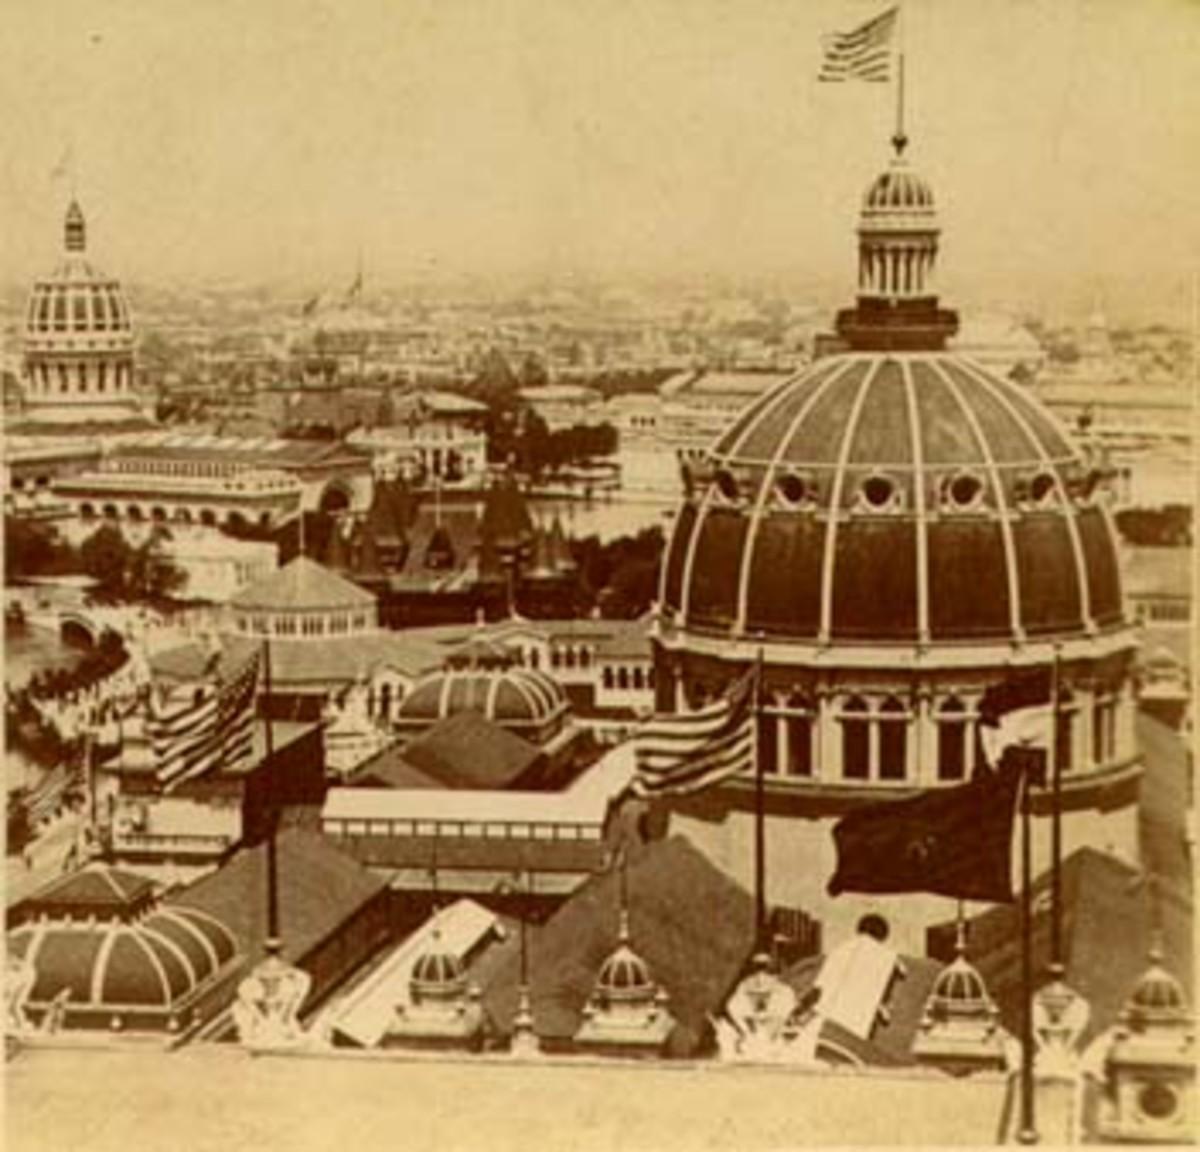 The White City, Chicago World's Fair, 1893